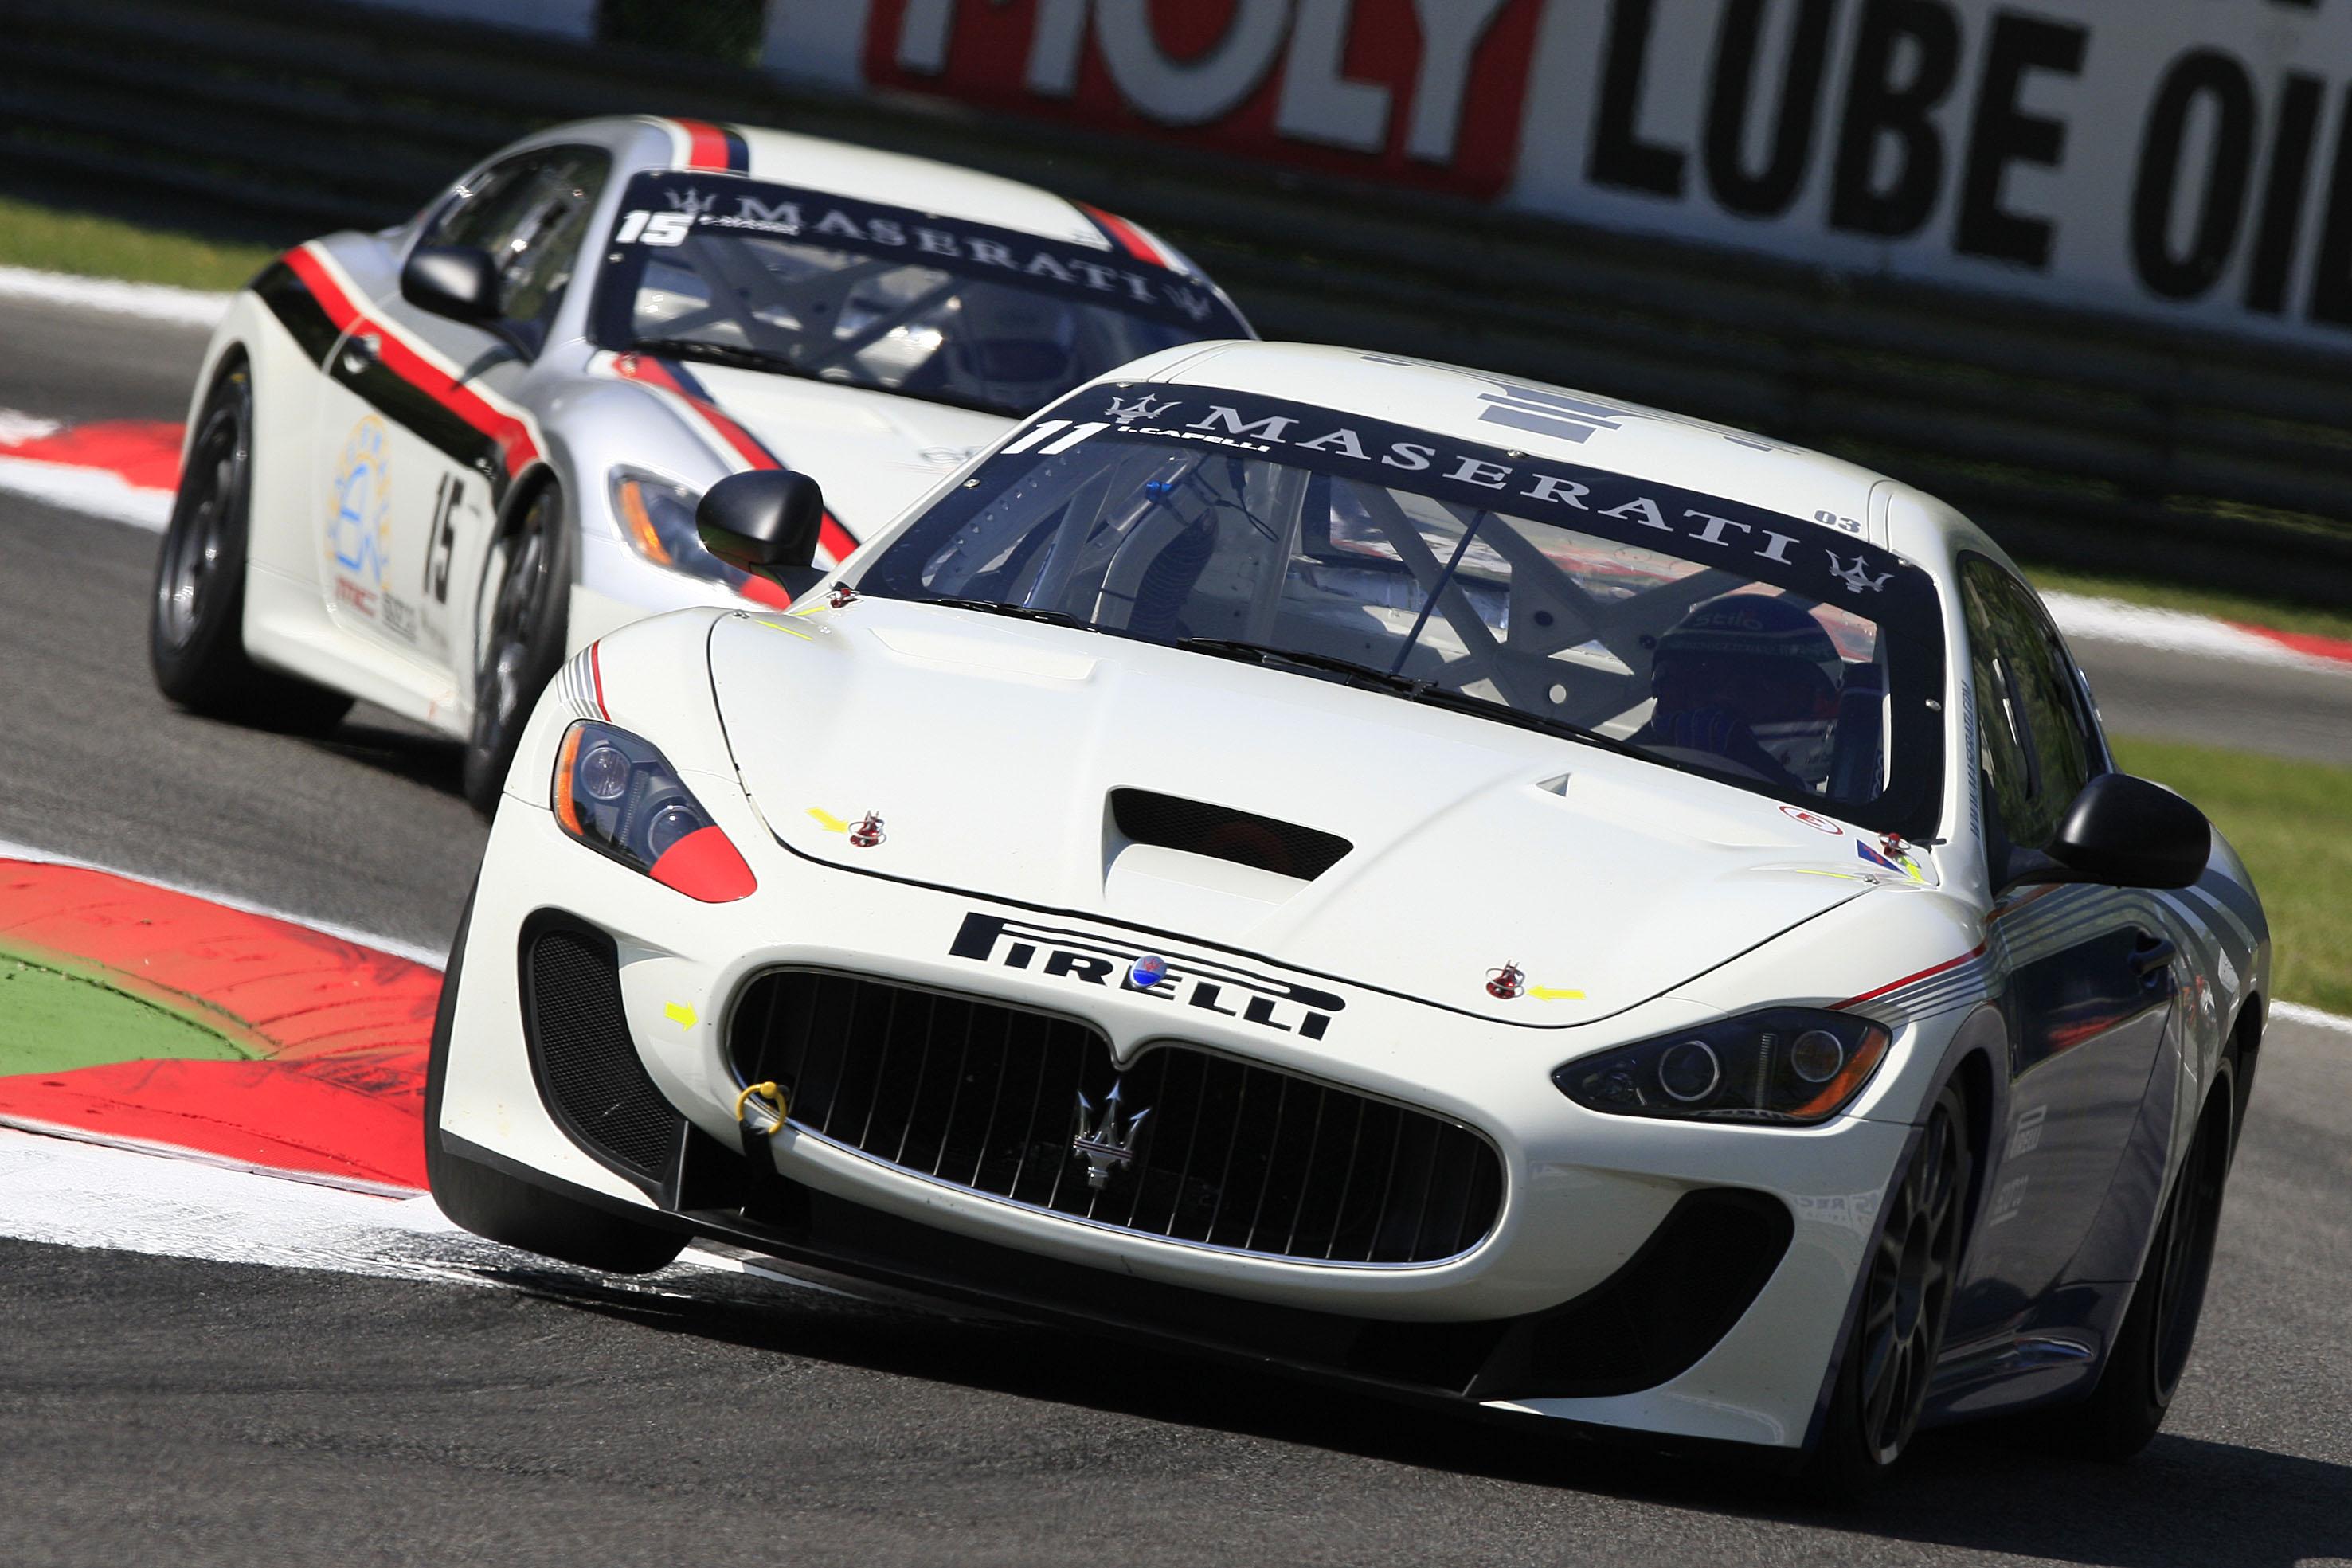 http://blogit.realwire.com/media/Maserati%20Trofeo%201.jpg